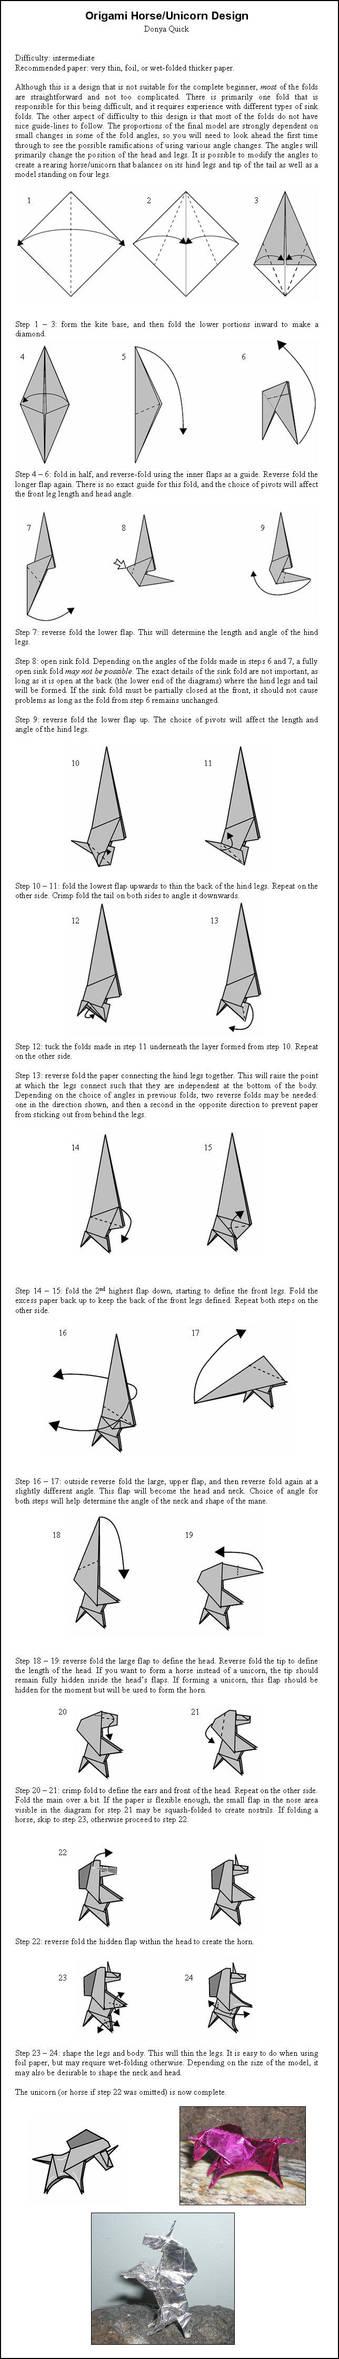 Origami Unicorn - Instructions by DonyaQuick